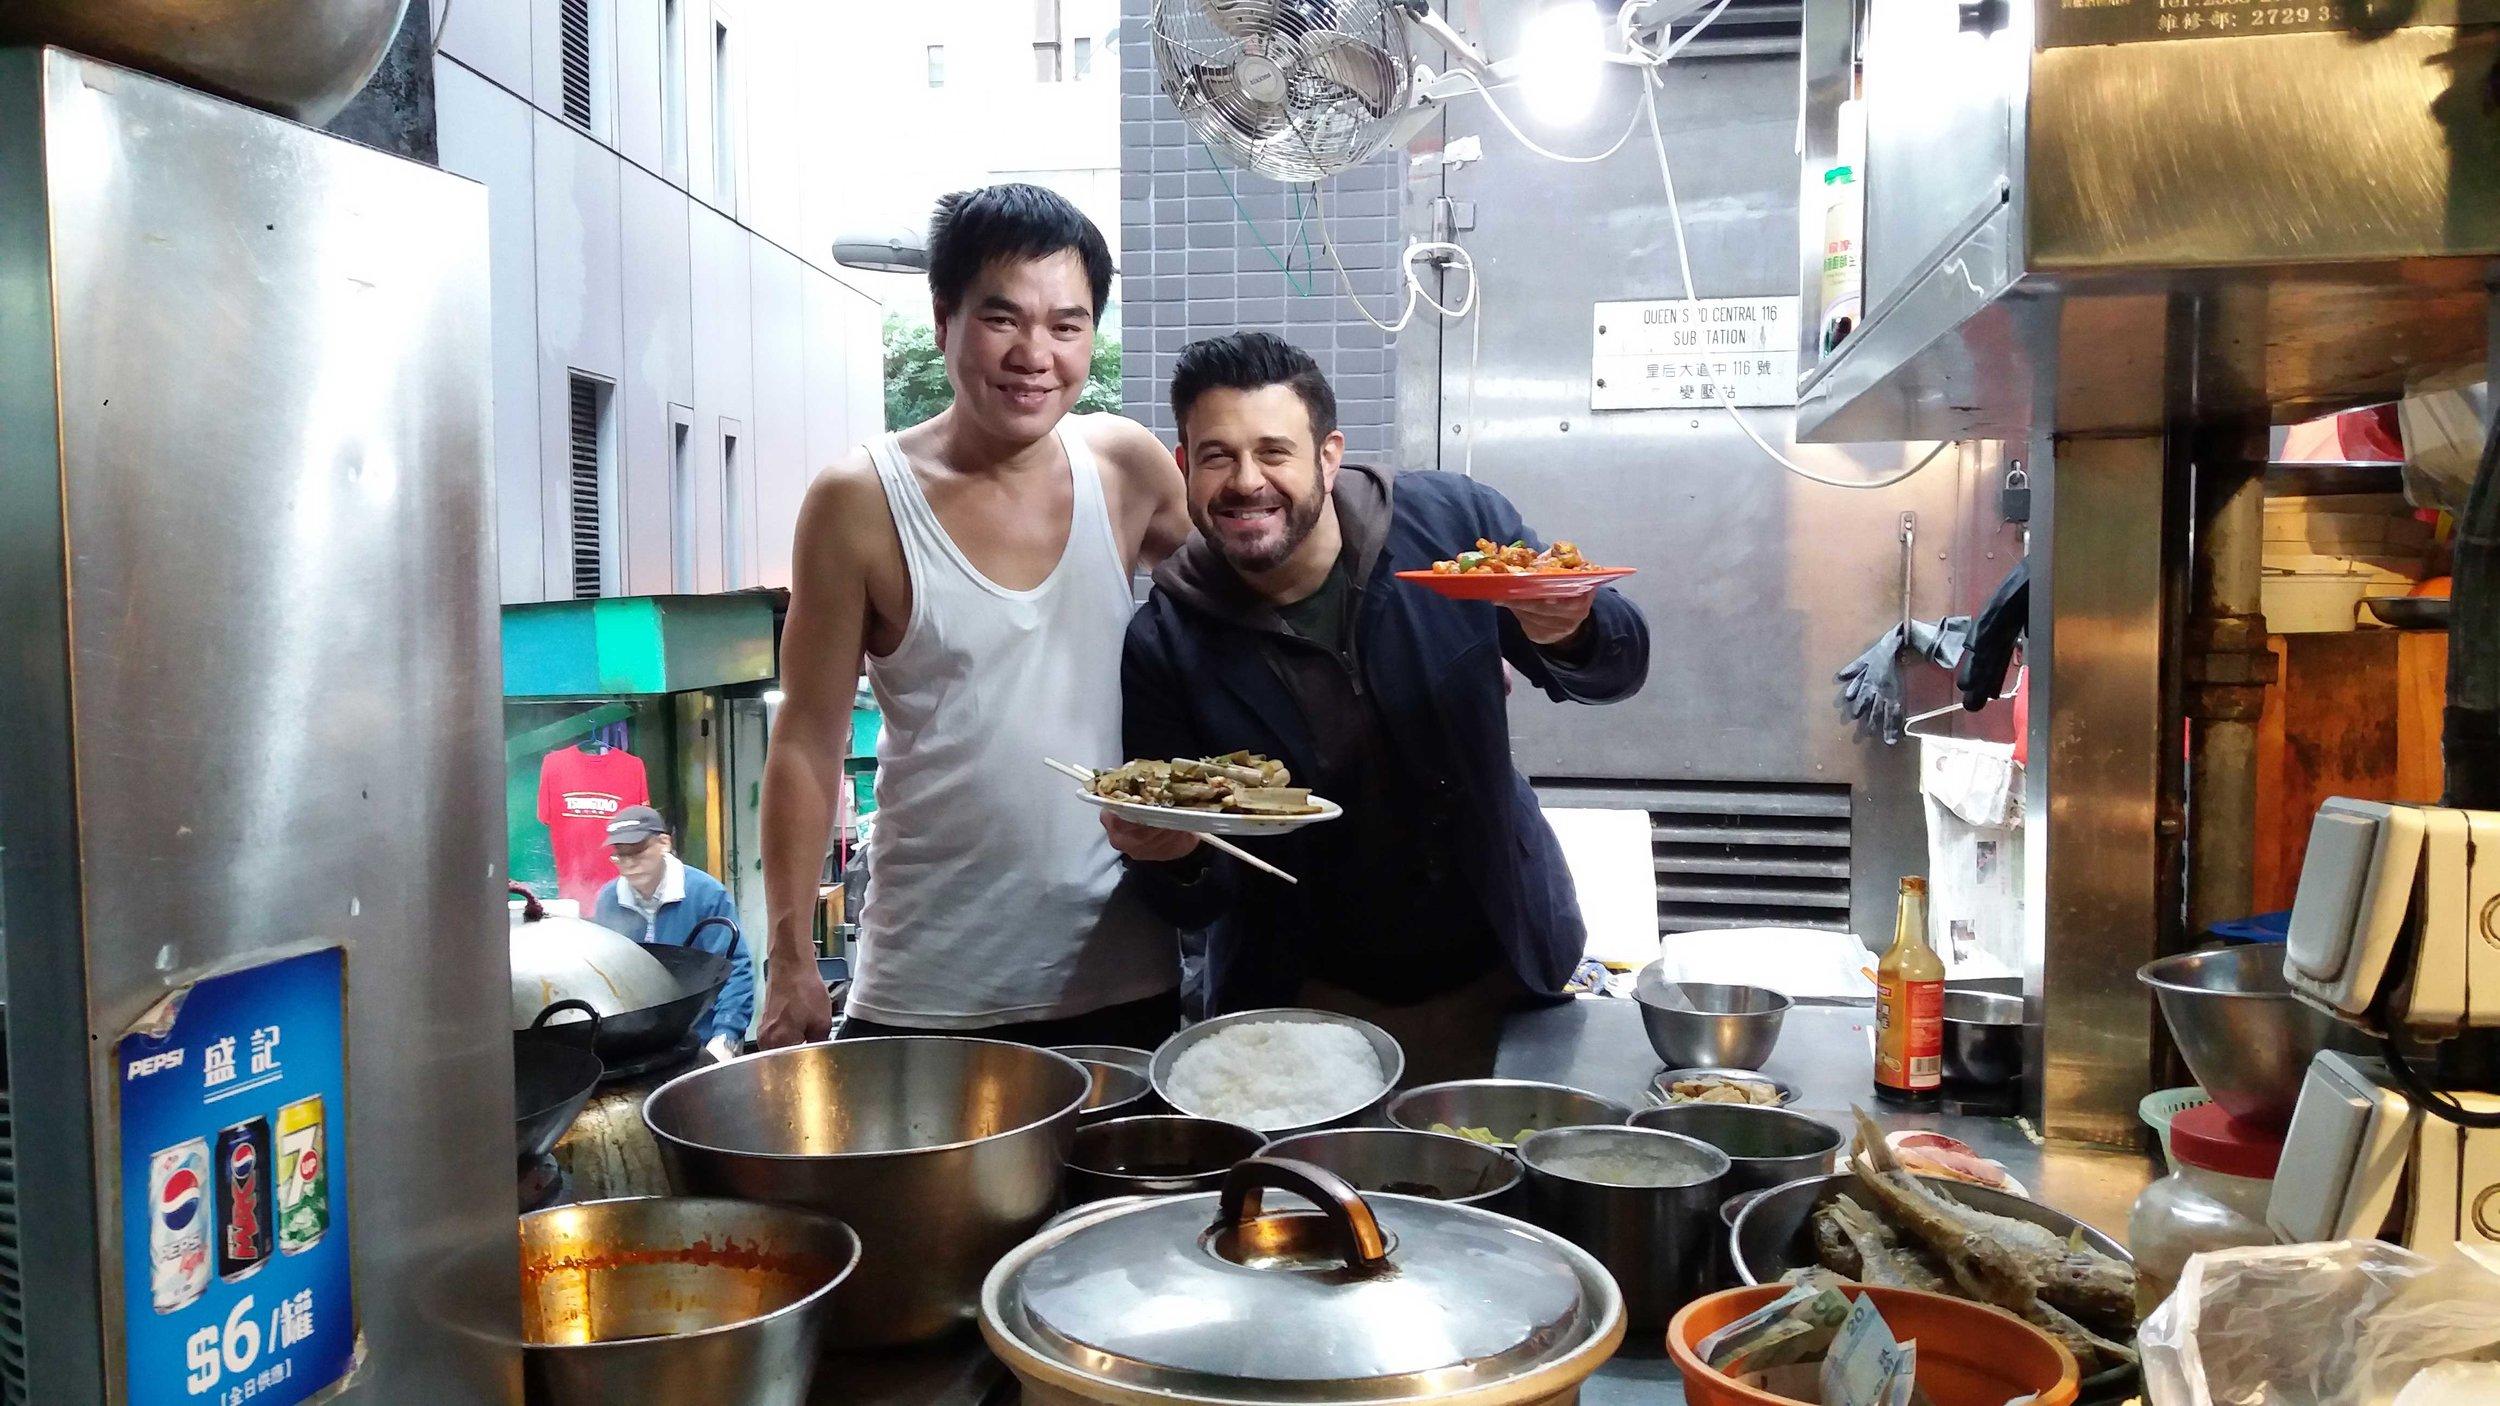 Secret Eats with Adam Richman -